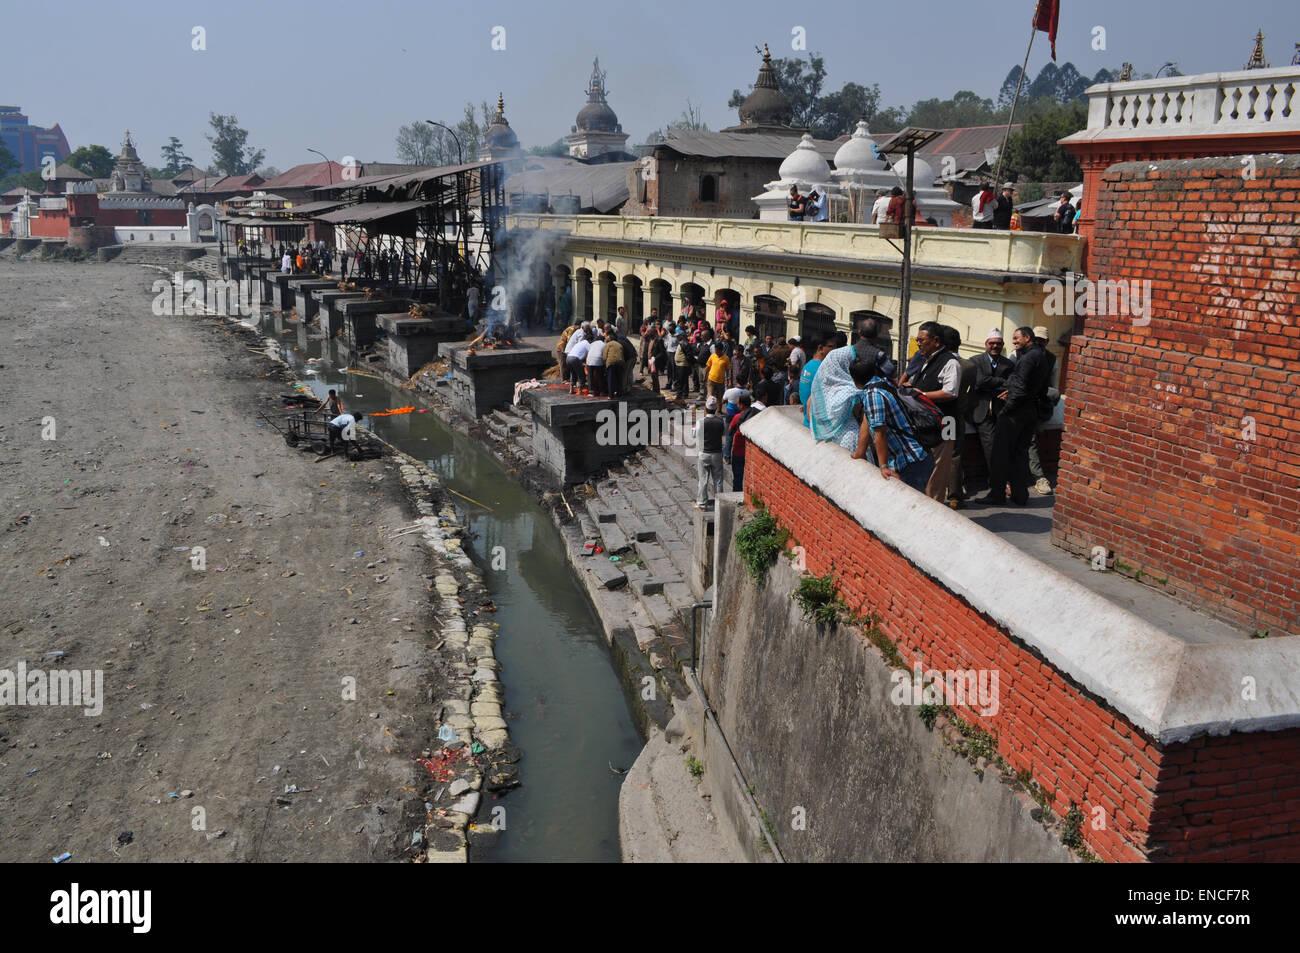 Funeral pyres at Pashupatinath temple on the banks of the Bagmati River, Kathmandu, Nepal. - Stock Image